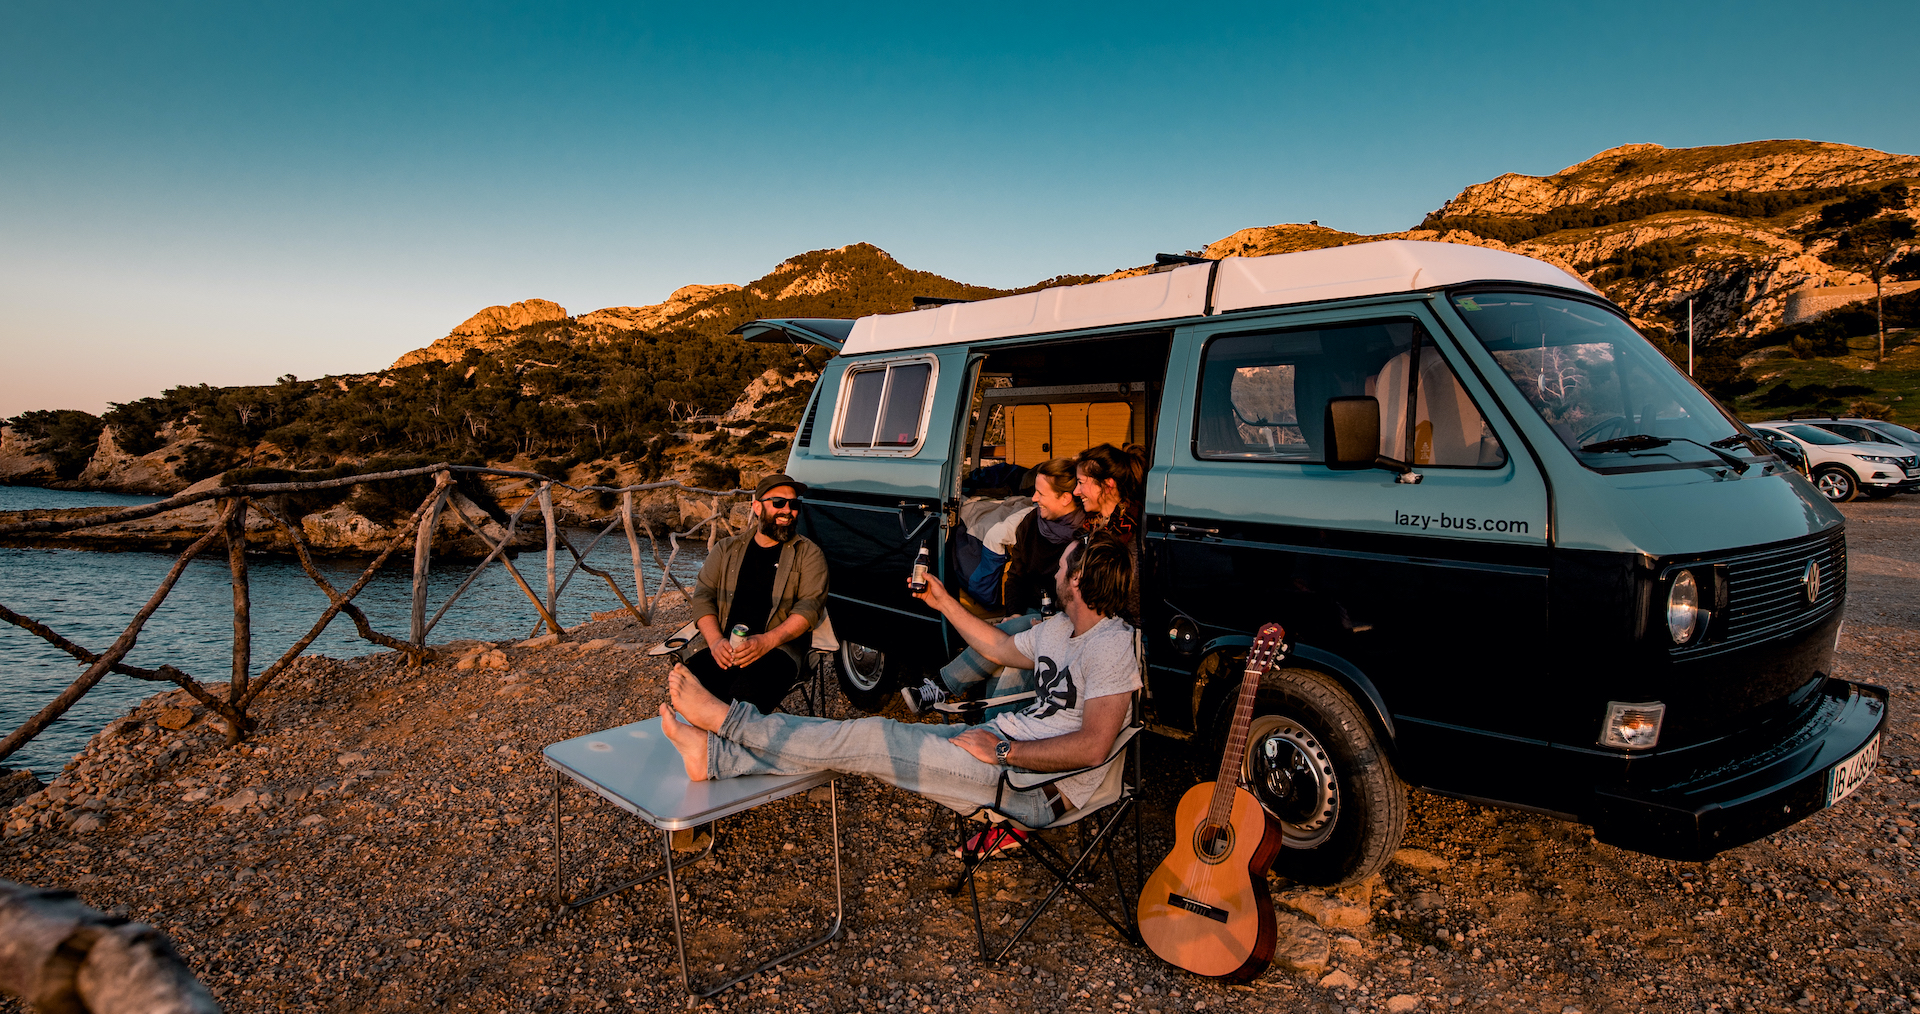 Ausflug unter Freunden mit Lazy Bus Mallorca